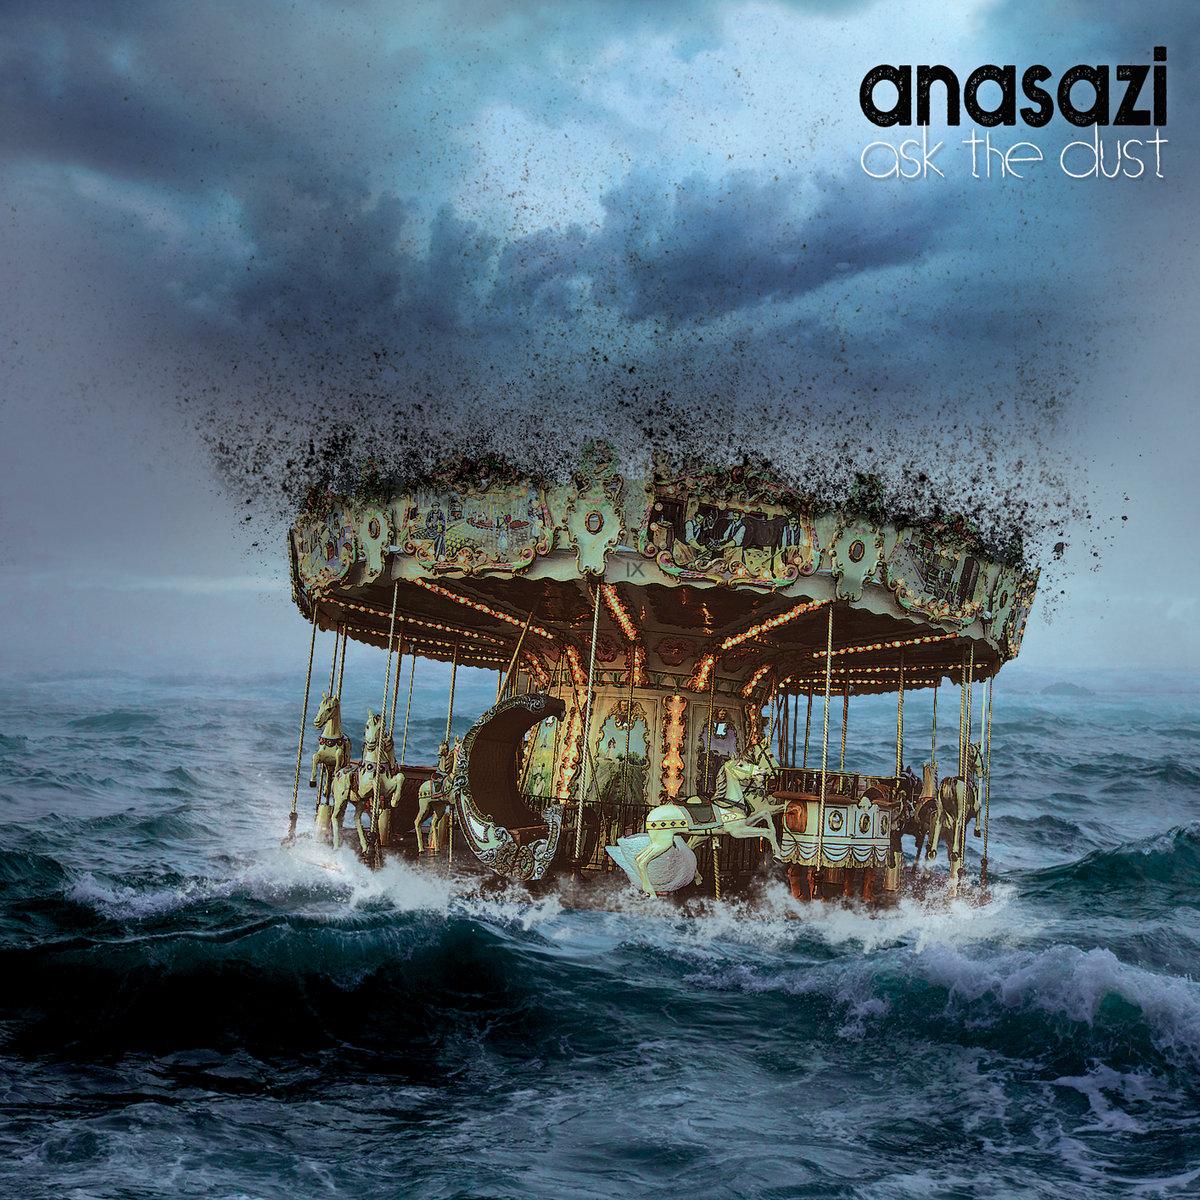 anasazi: ask the dust